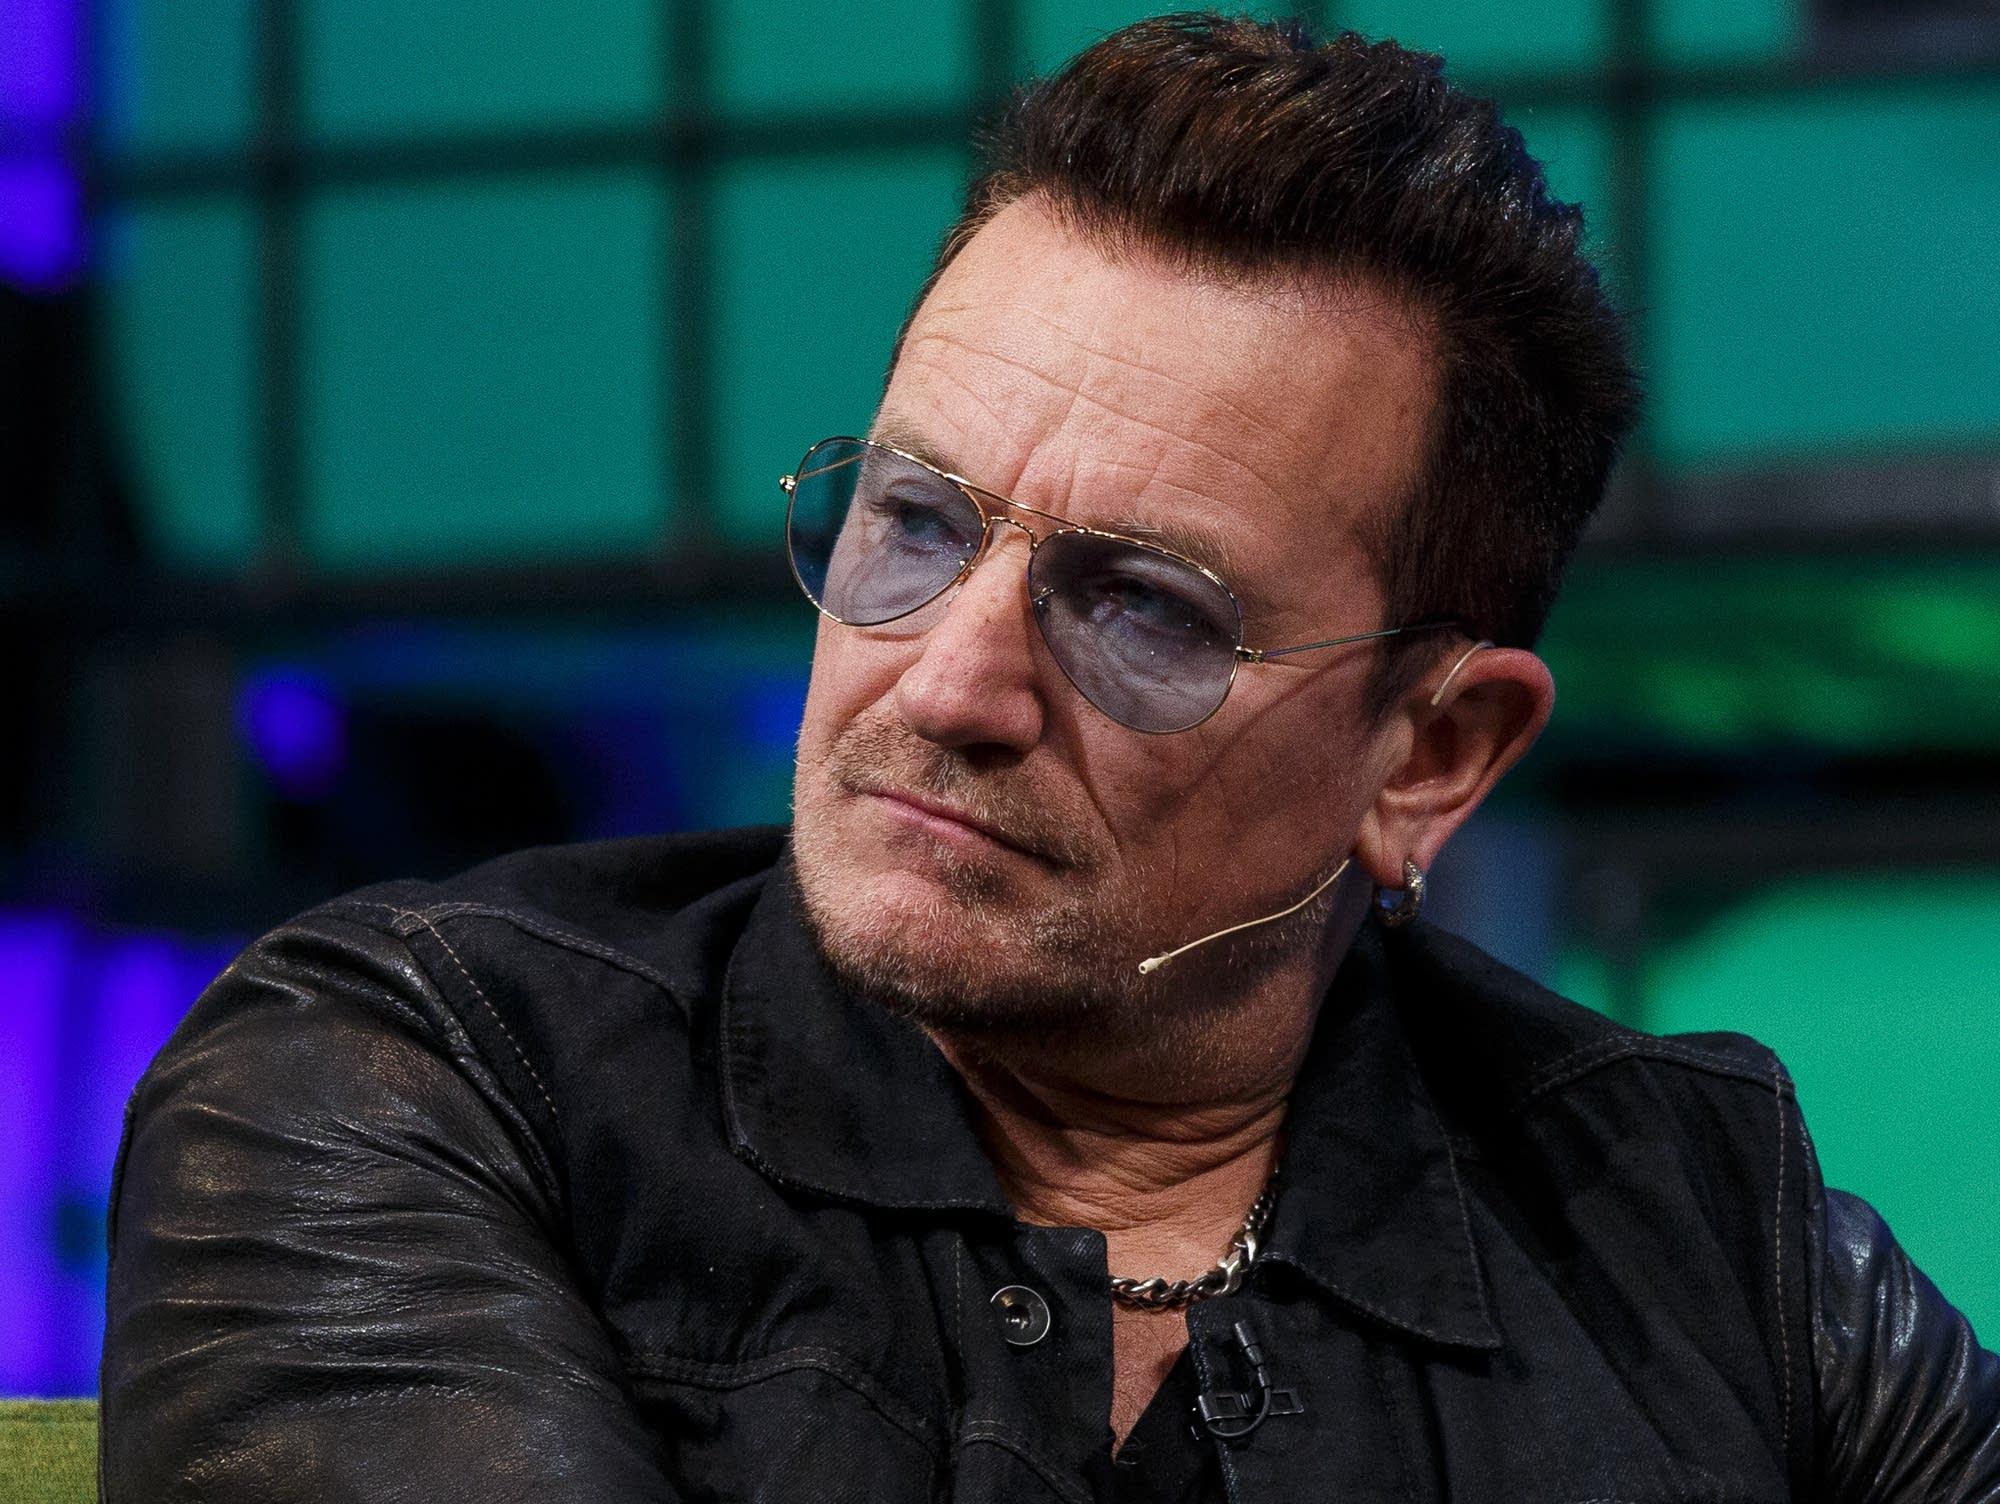 Bono at the 2014 Web Summit in Dublin.